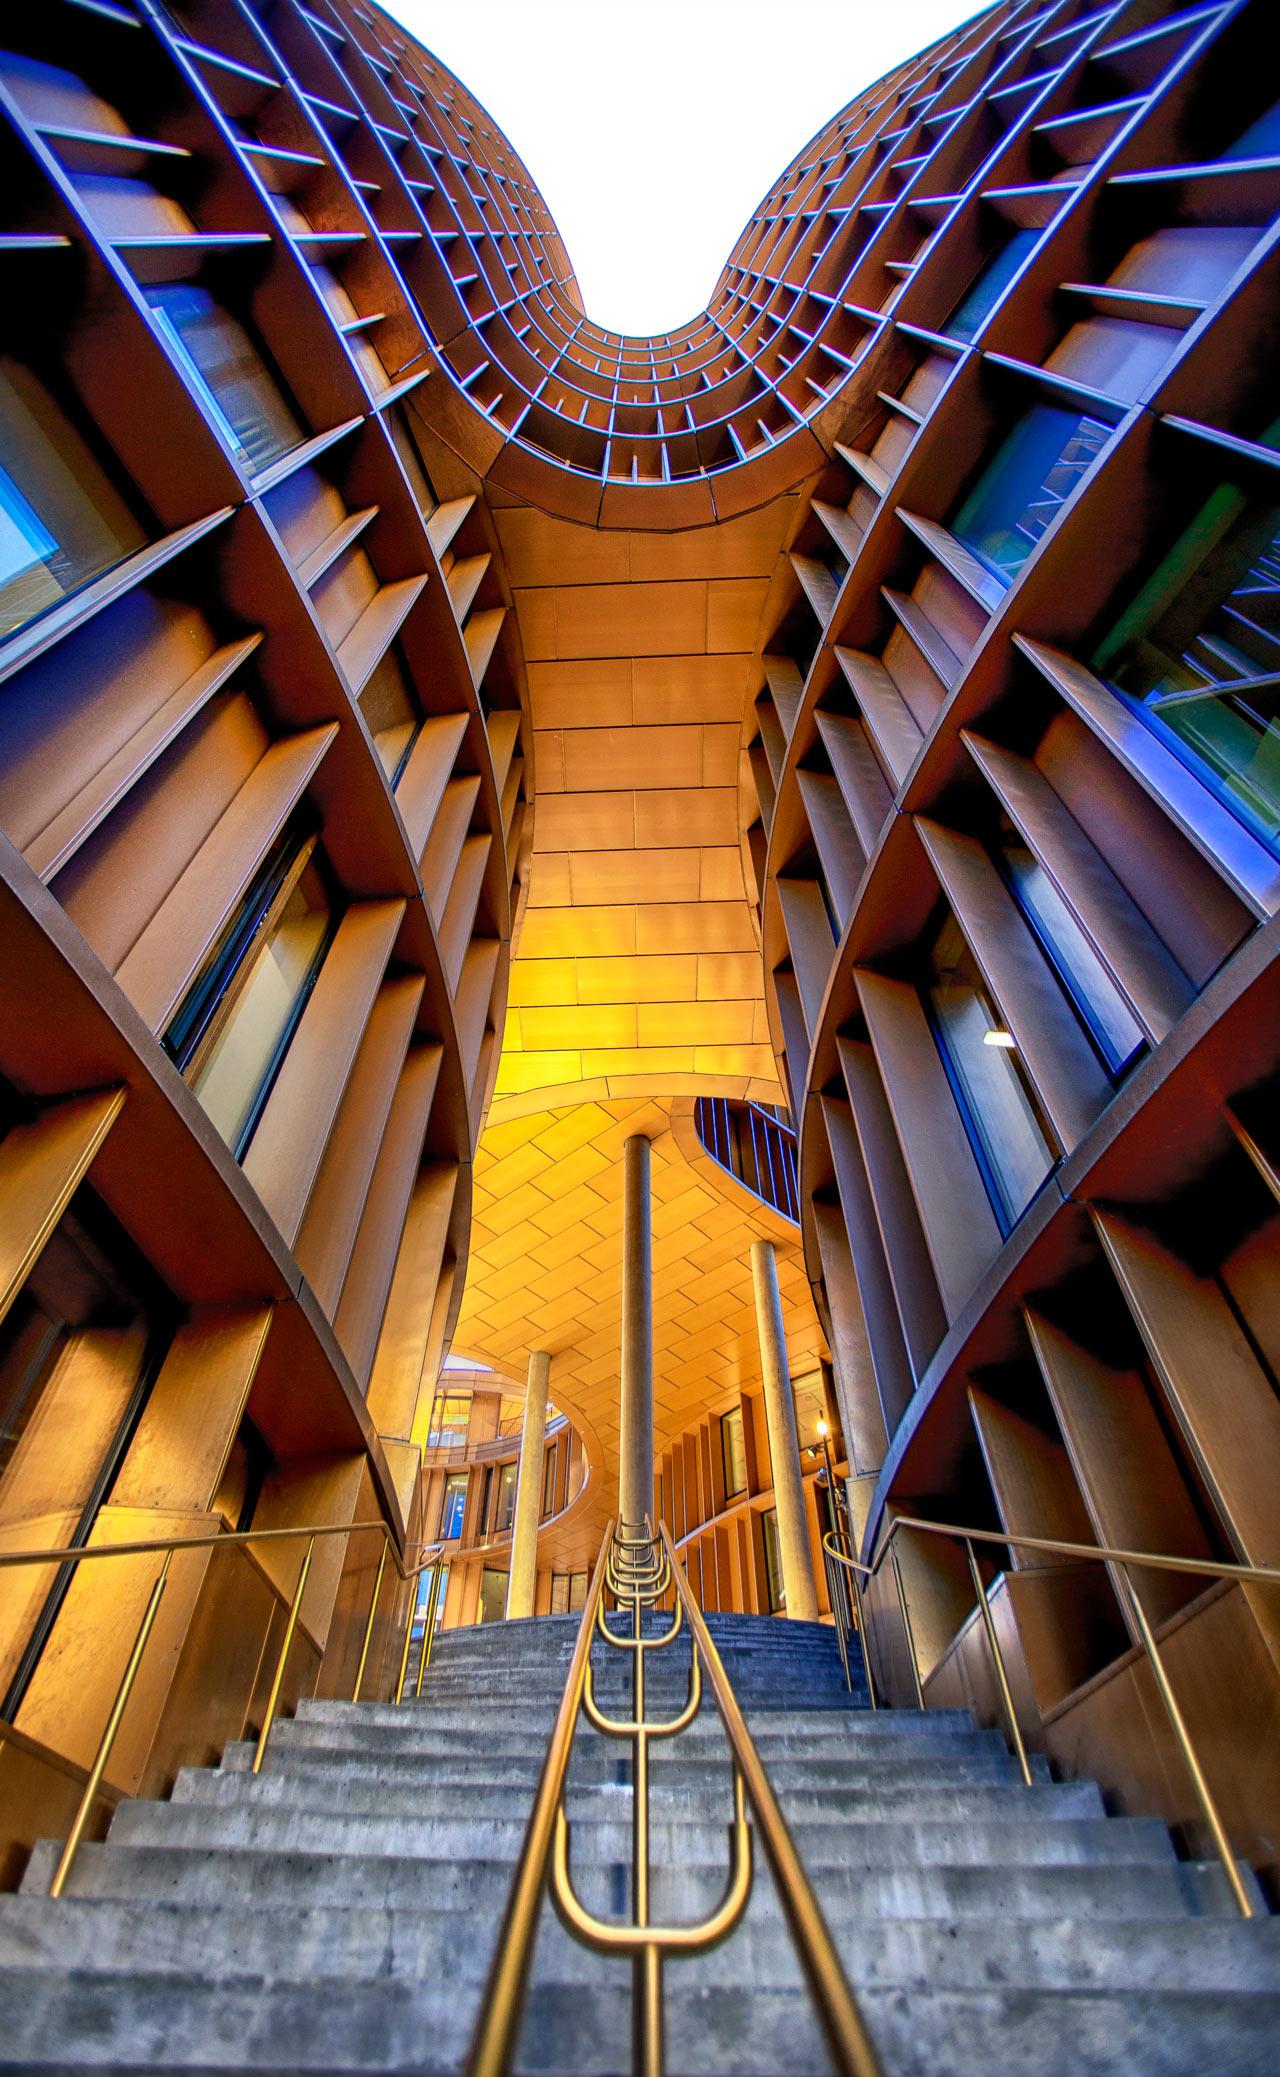 Axel, towers, koebenhavn, arkitektur